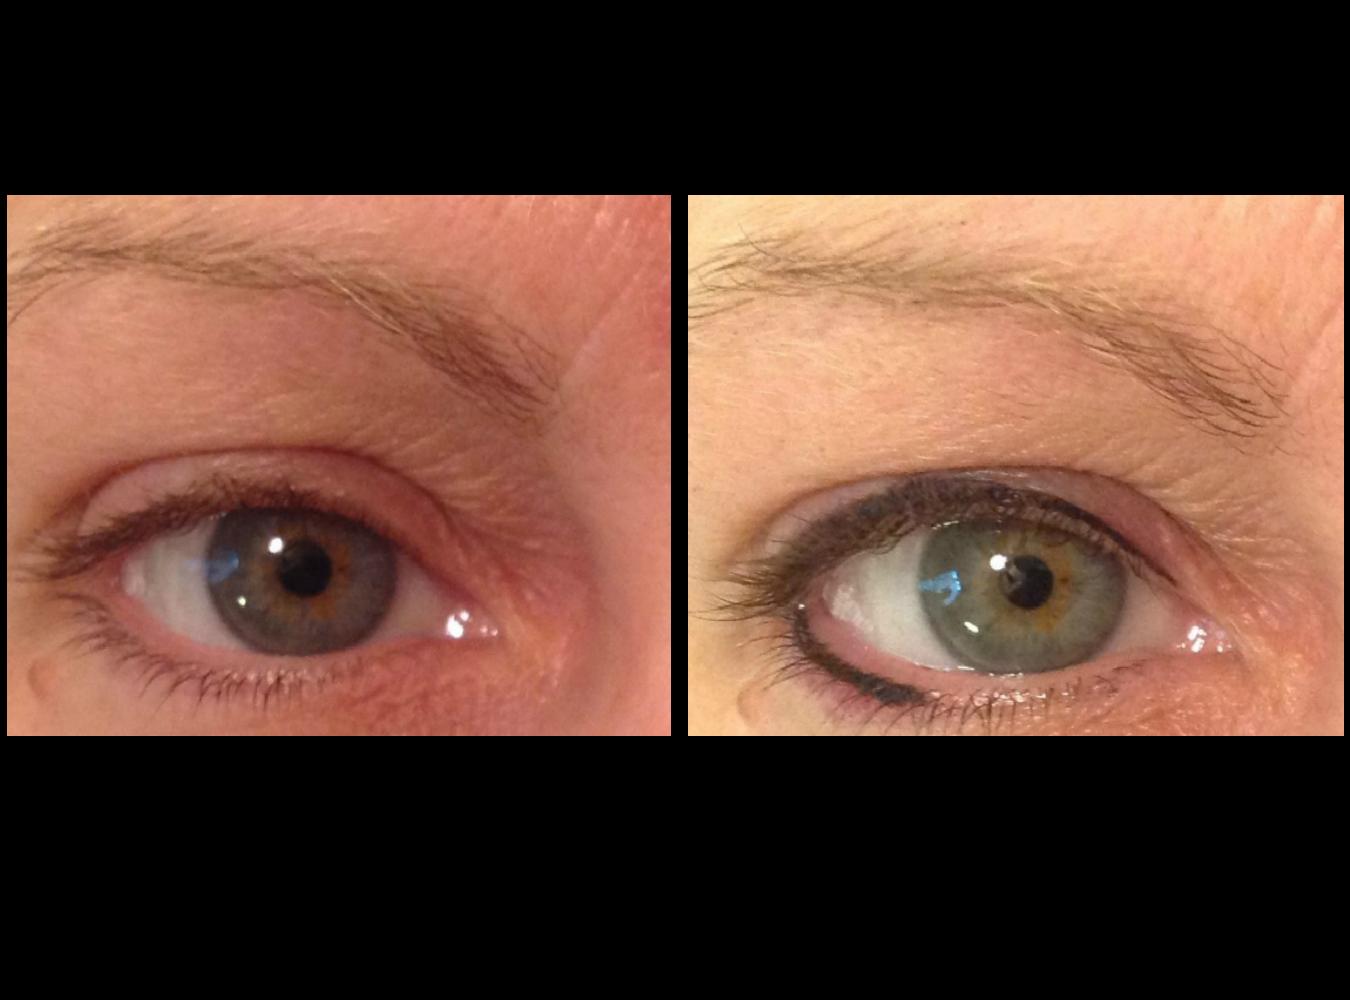 Maquillage permanent - Eyeliner